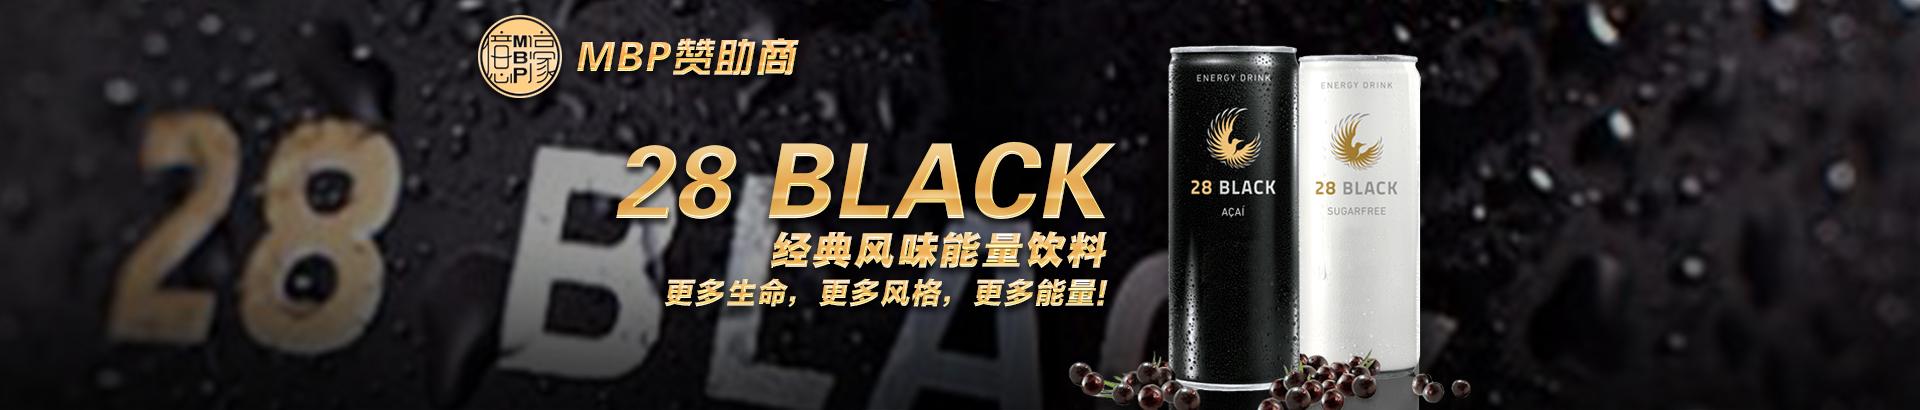 28 BLACK经典风味能量饮料正式成为MBP赞助商